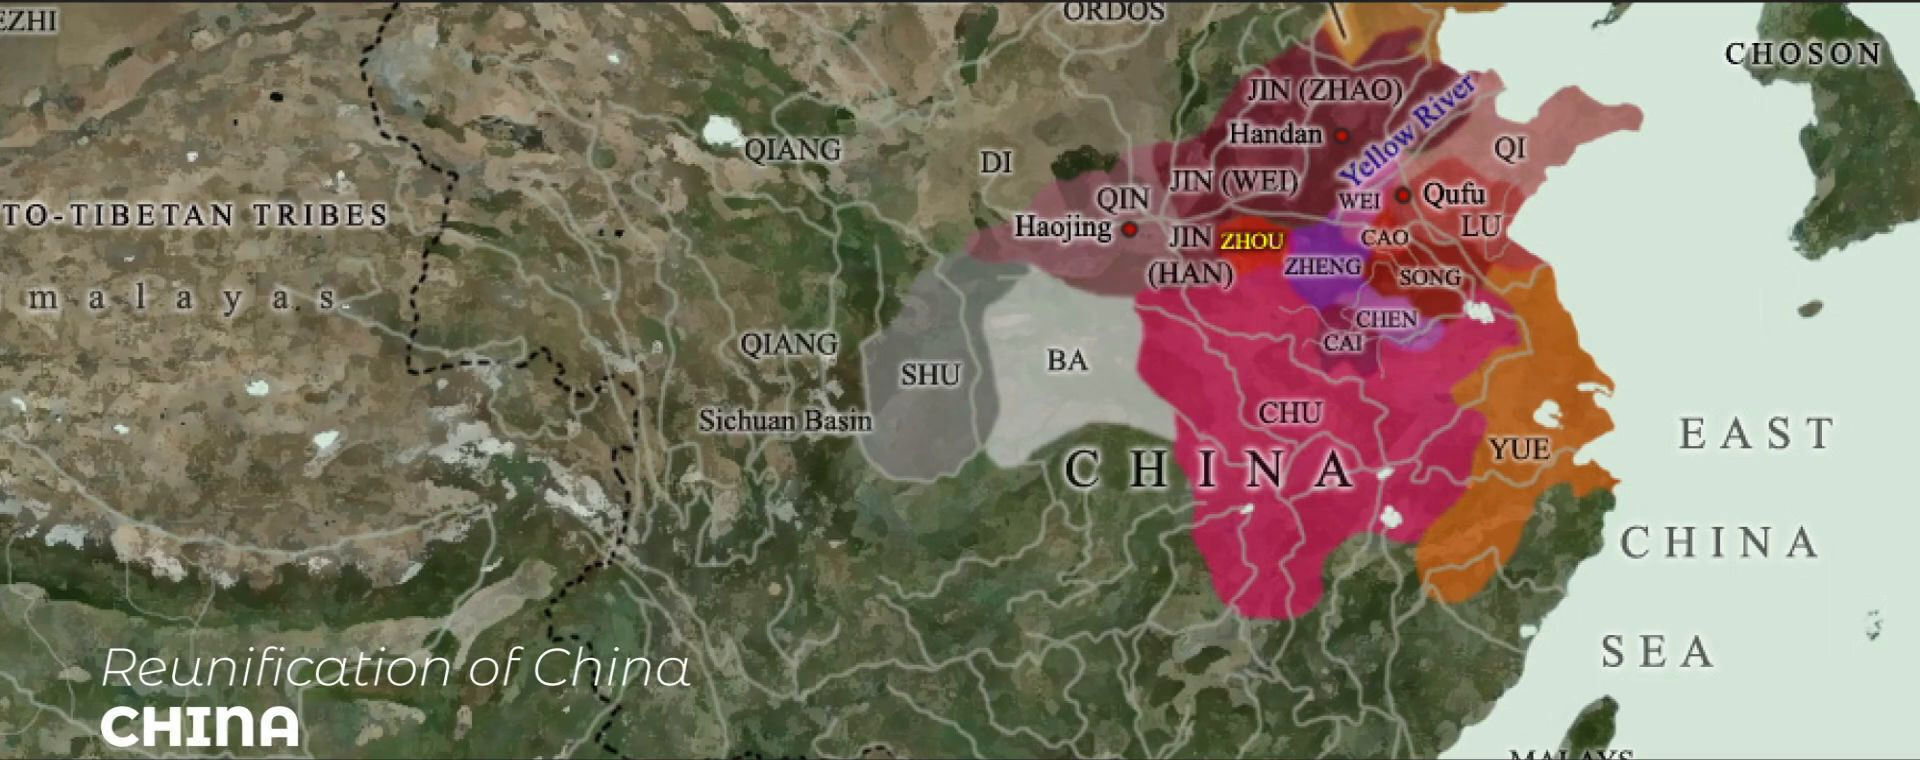 REUNIFICATION OF CHINA